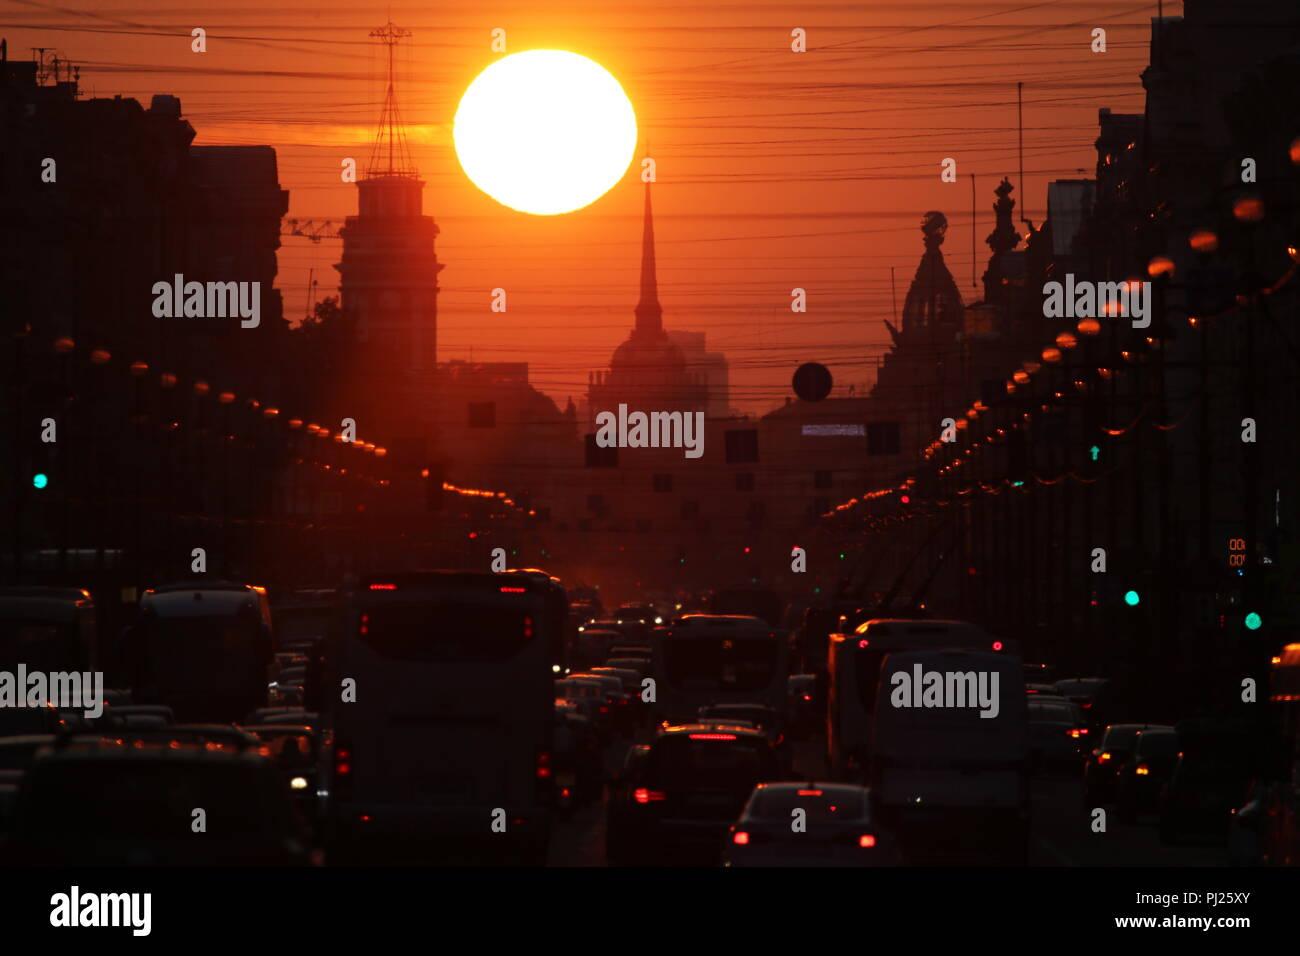 St Petersburg, Russia. 03rd Sep, 2018. St PETERSBURG, RUSSIA - SEPTEMBER 3, 2018: Sun setting over a traffic jam in Nevsky Prospekt Street. Peter Kovalev/TASS Credit: ITAR-TASS News Agency/Alamy Live News - Stock Photo